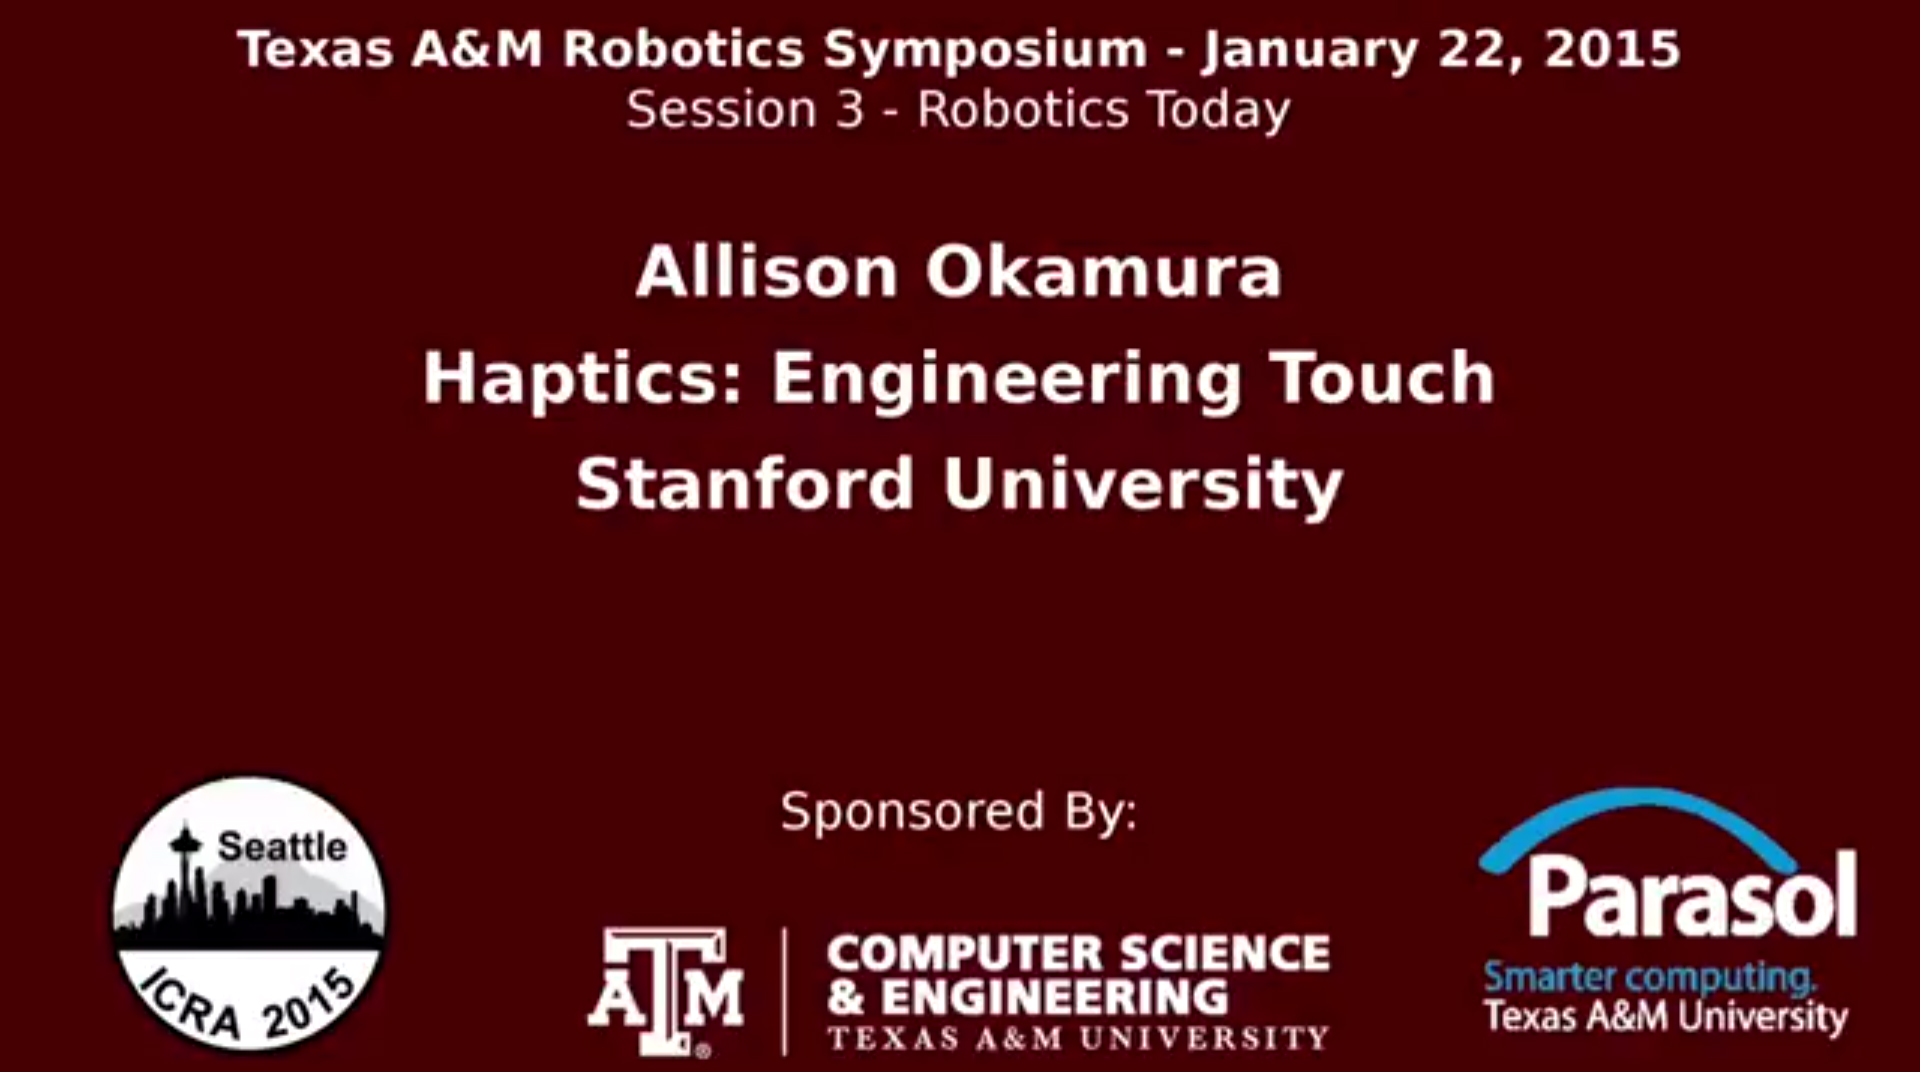 Texas A&M Robotics Symposium